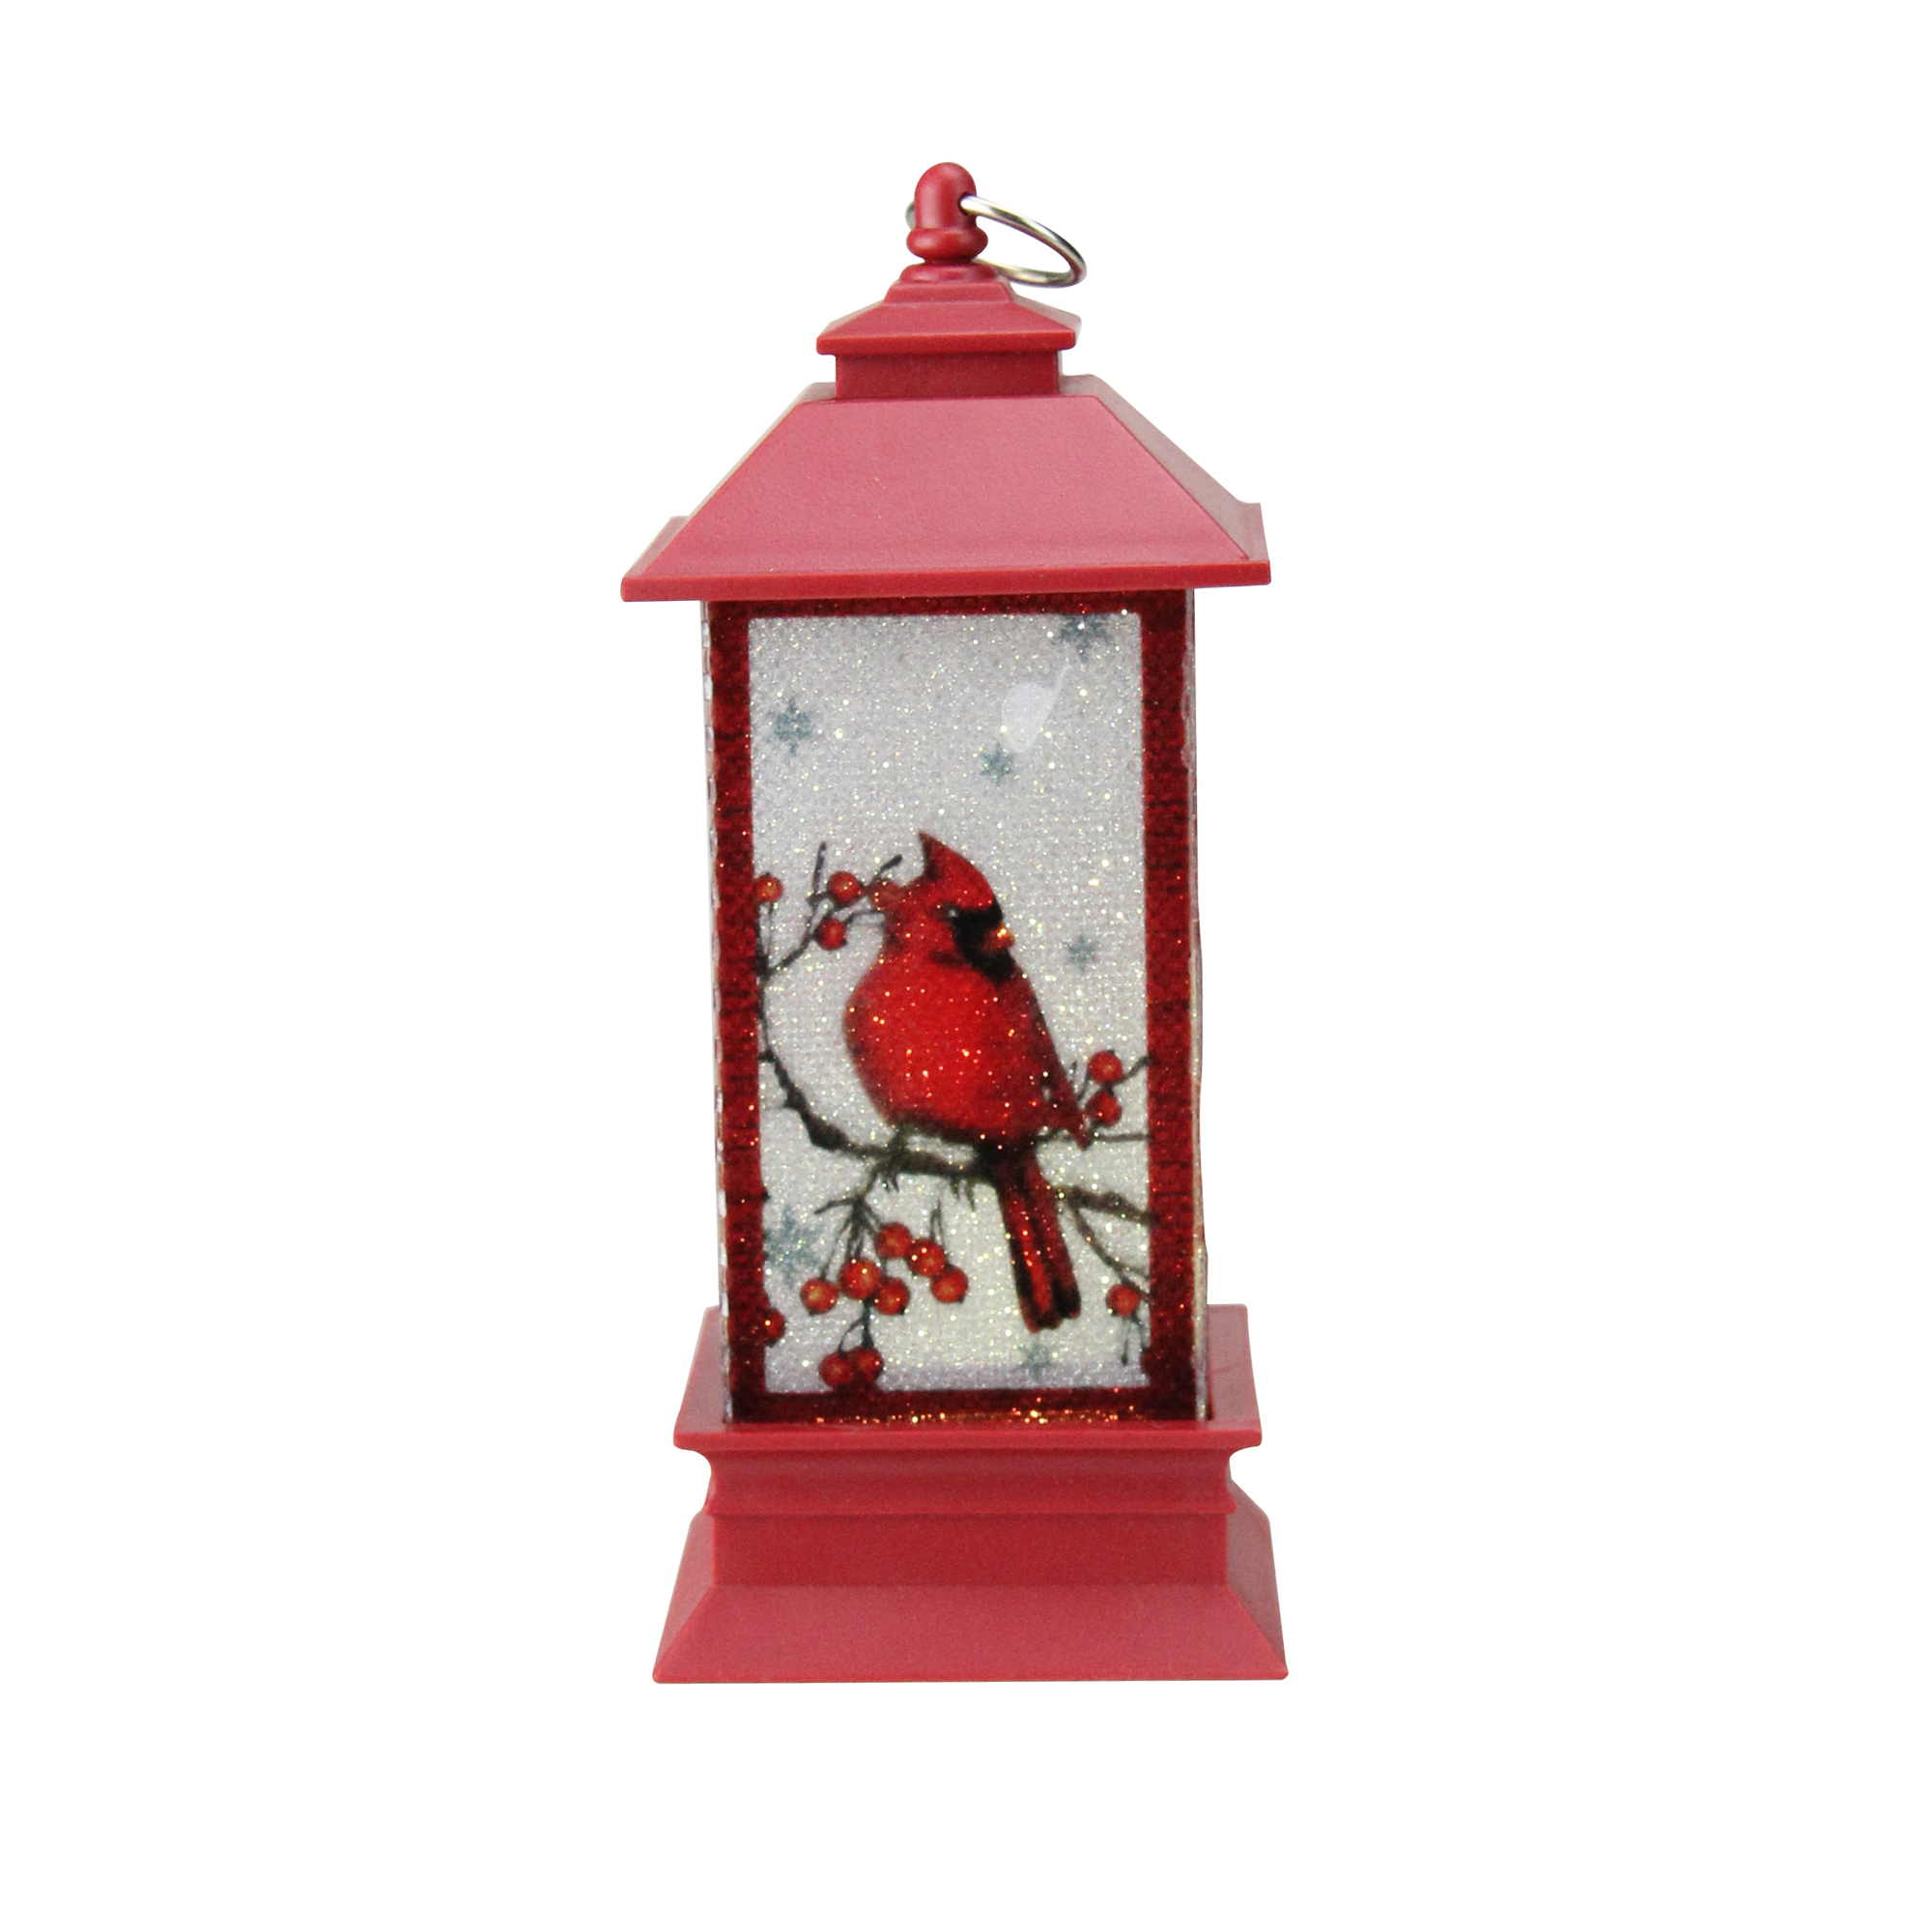 Plastic Inspirational Celebrate The Season Swirl Cardinal Lantern on Pedestal Durable Home Decor Battery Operated Roman Christmas Christmas Decor Christmas Collection 12 H